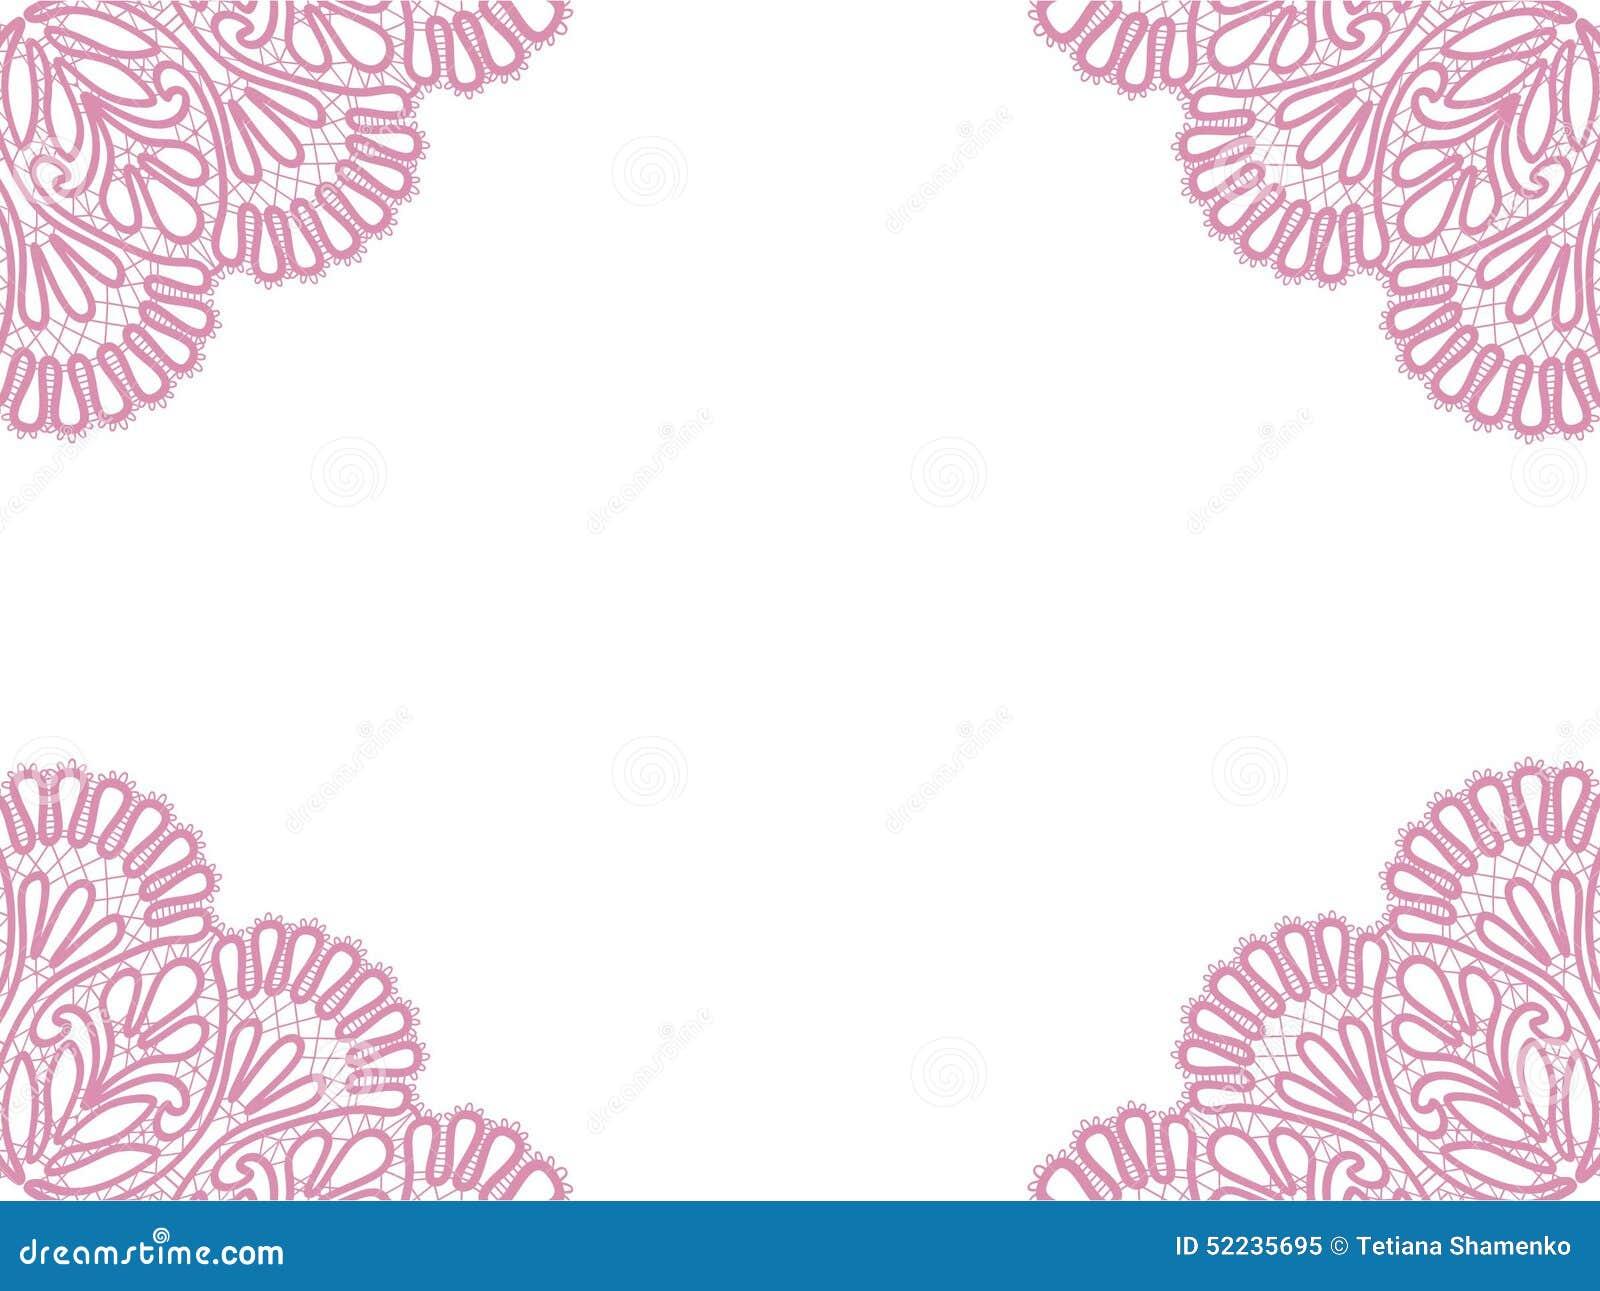 Template Frame Design For Card Stock Illustration